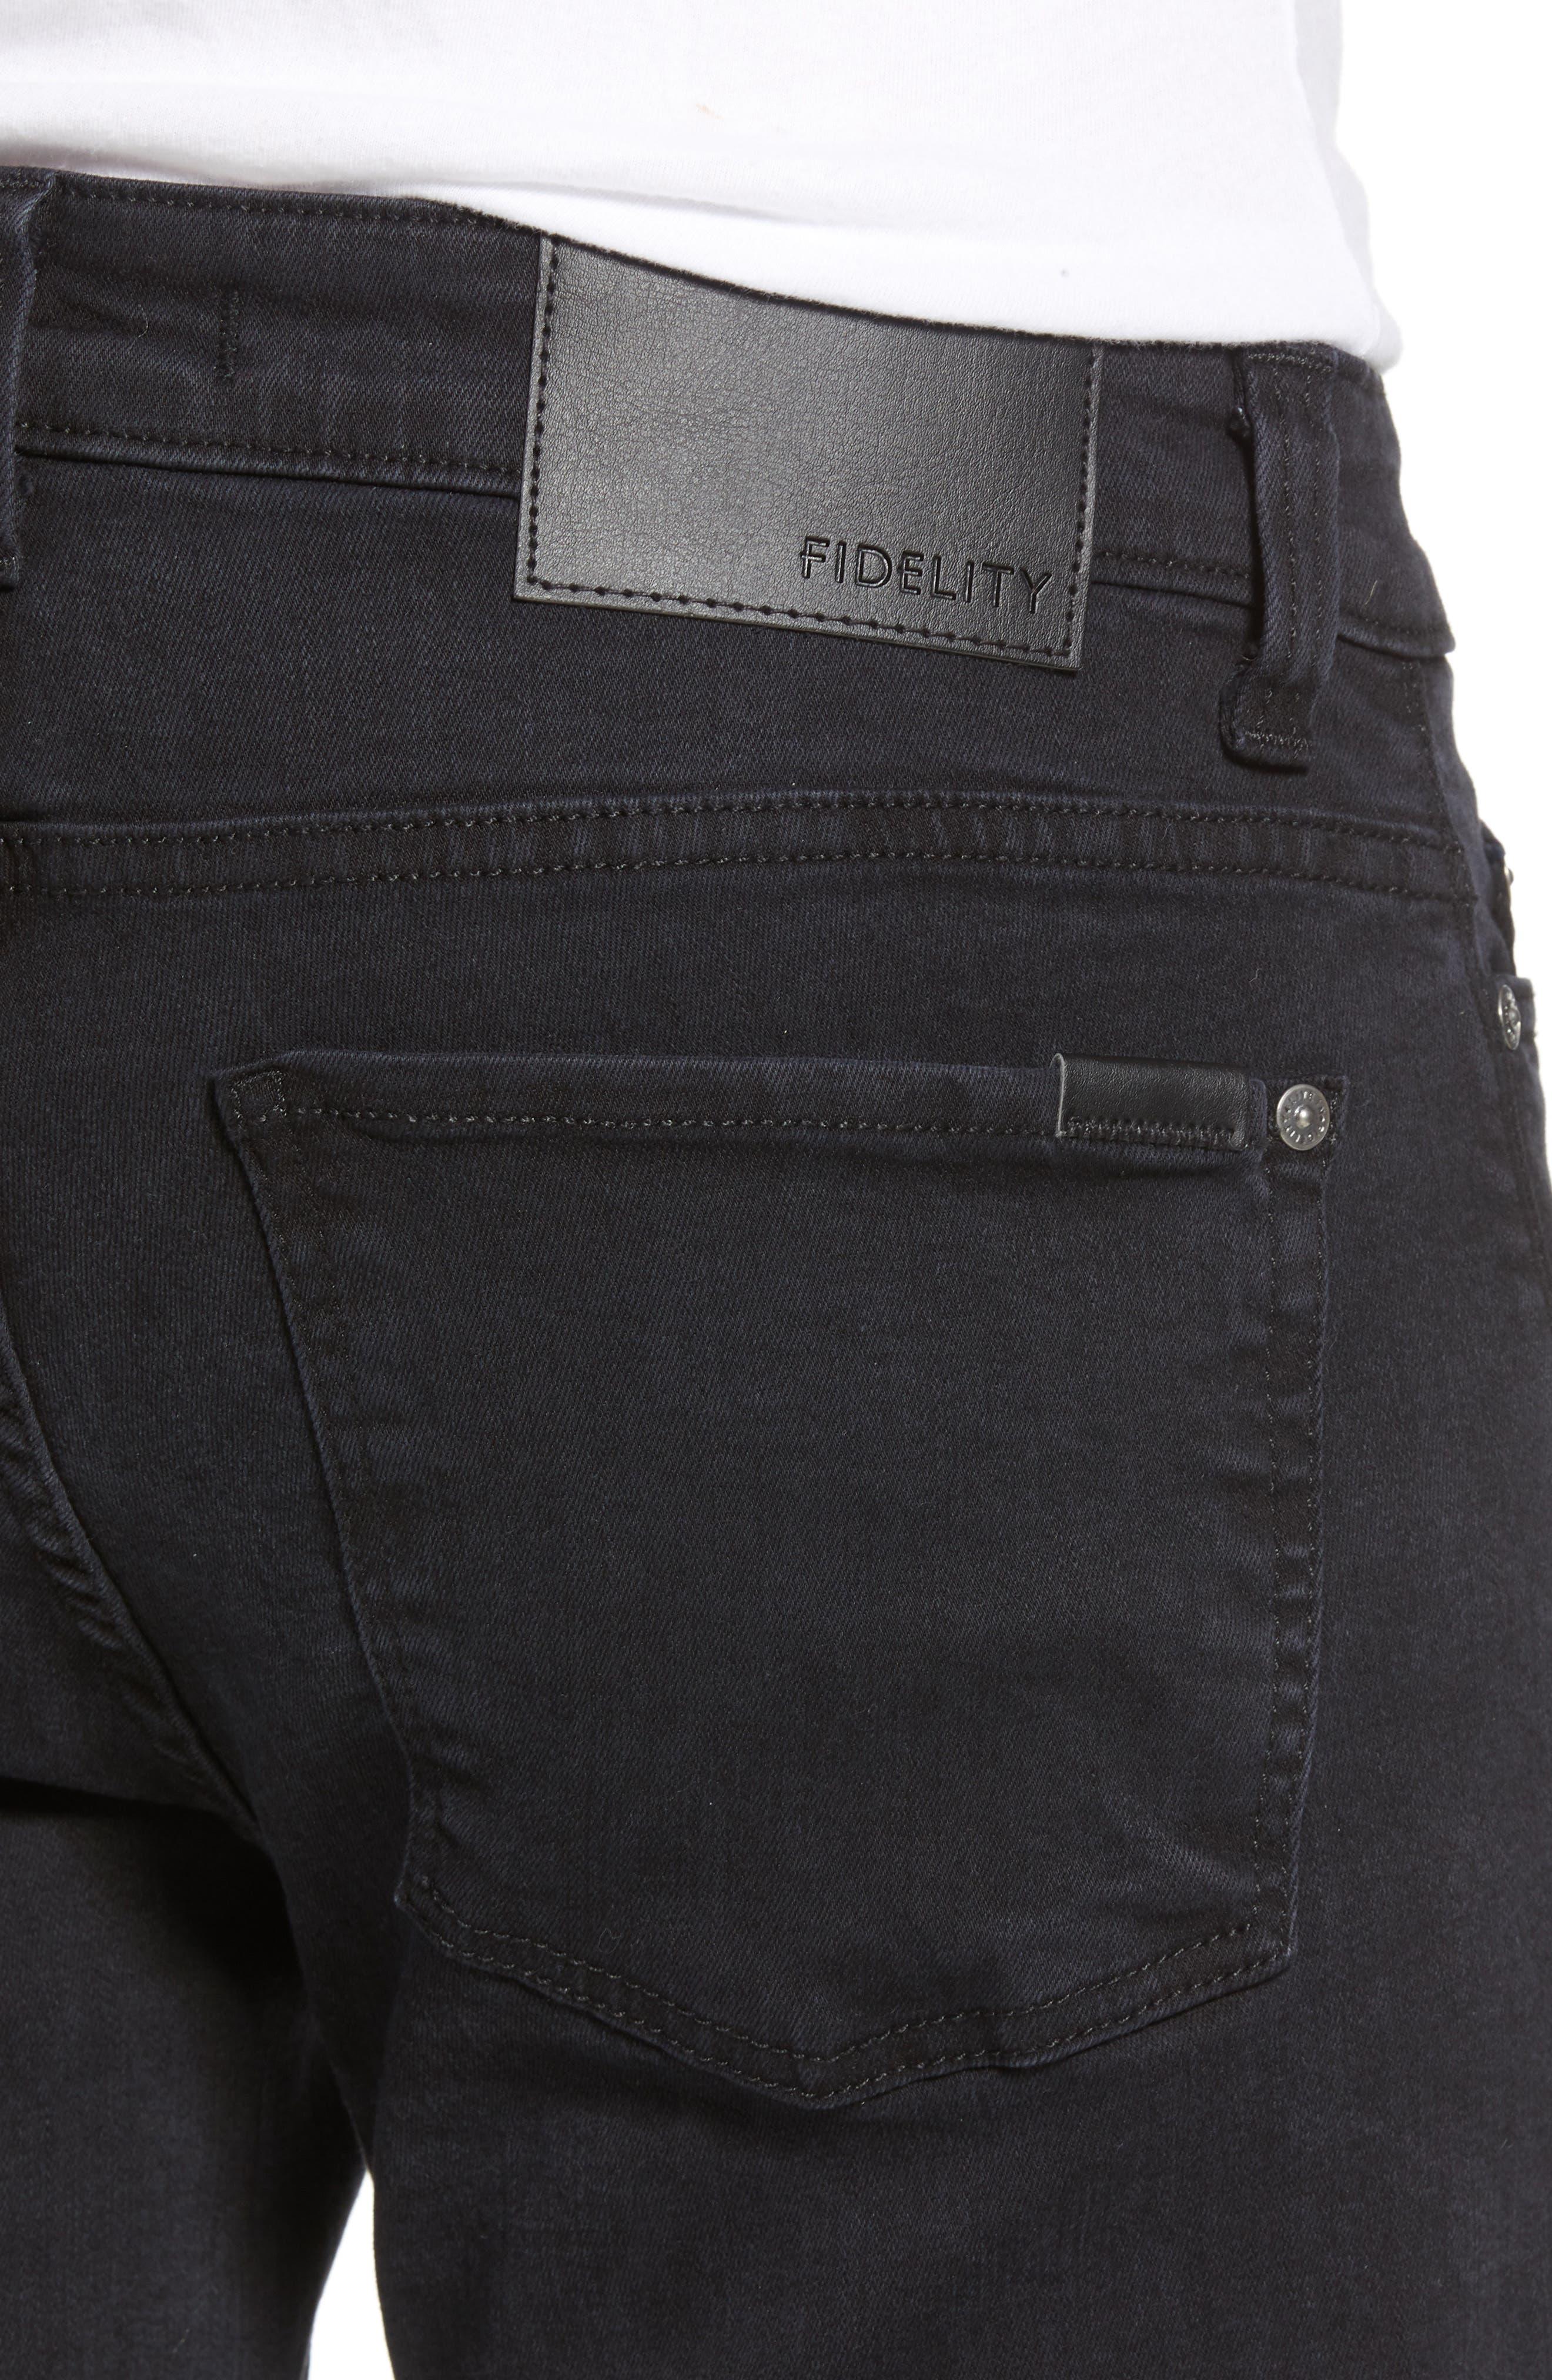 Torino Slim Fit Jeans,                             Alternate thumbnail 4, color,                             001